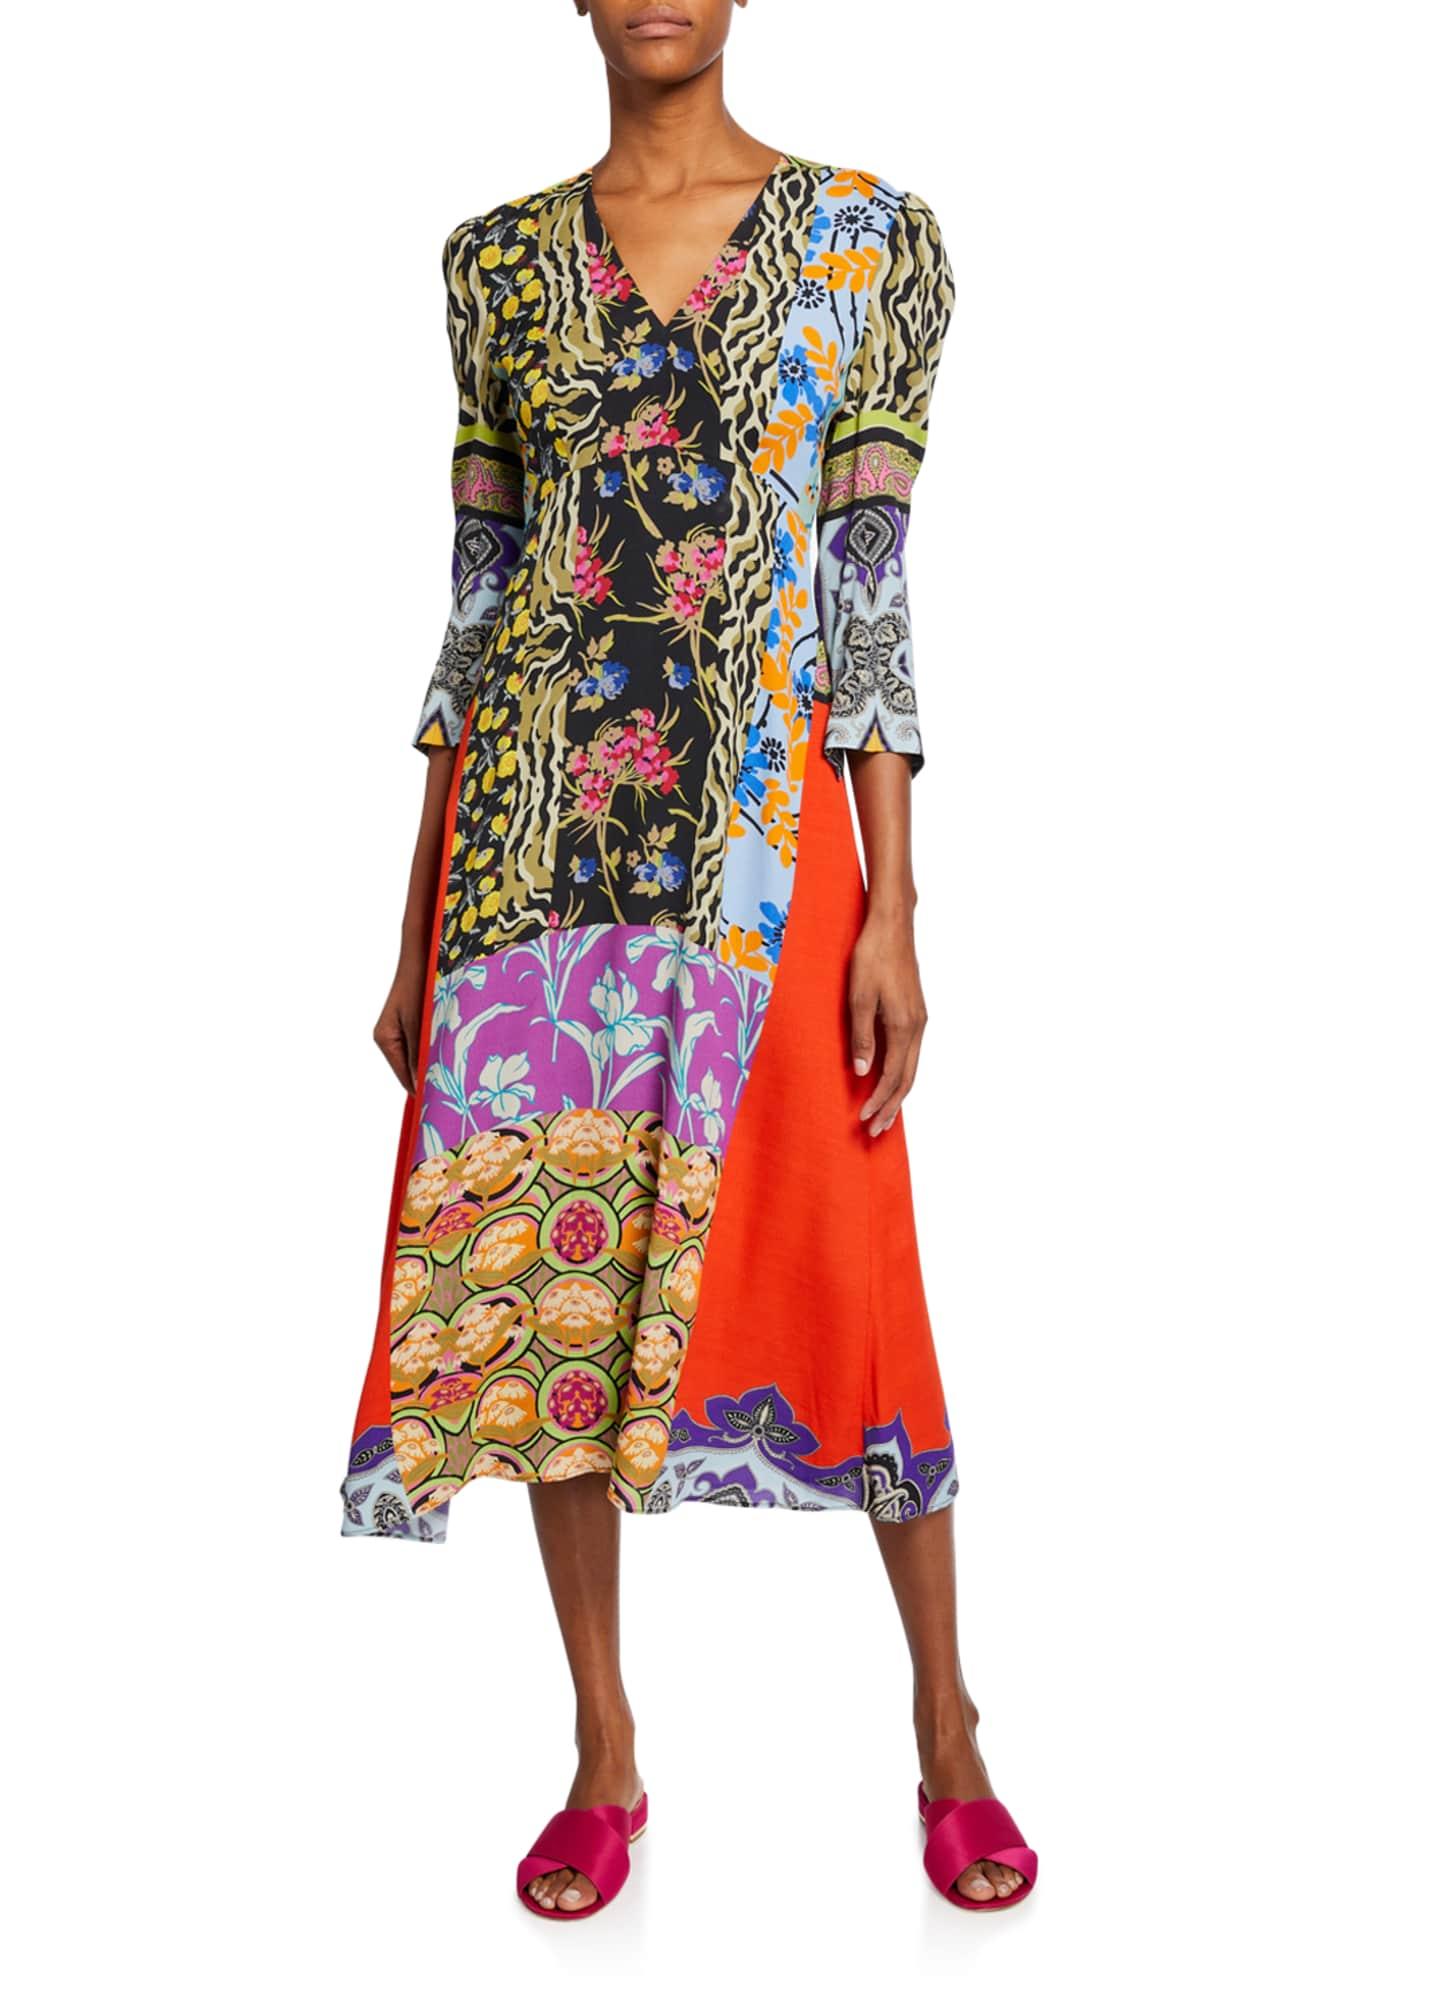 Etro Animal Print & Floral Collage Patchwork Dress